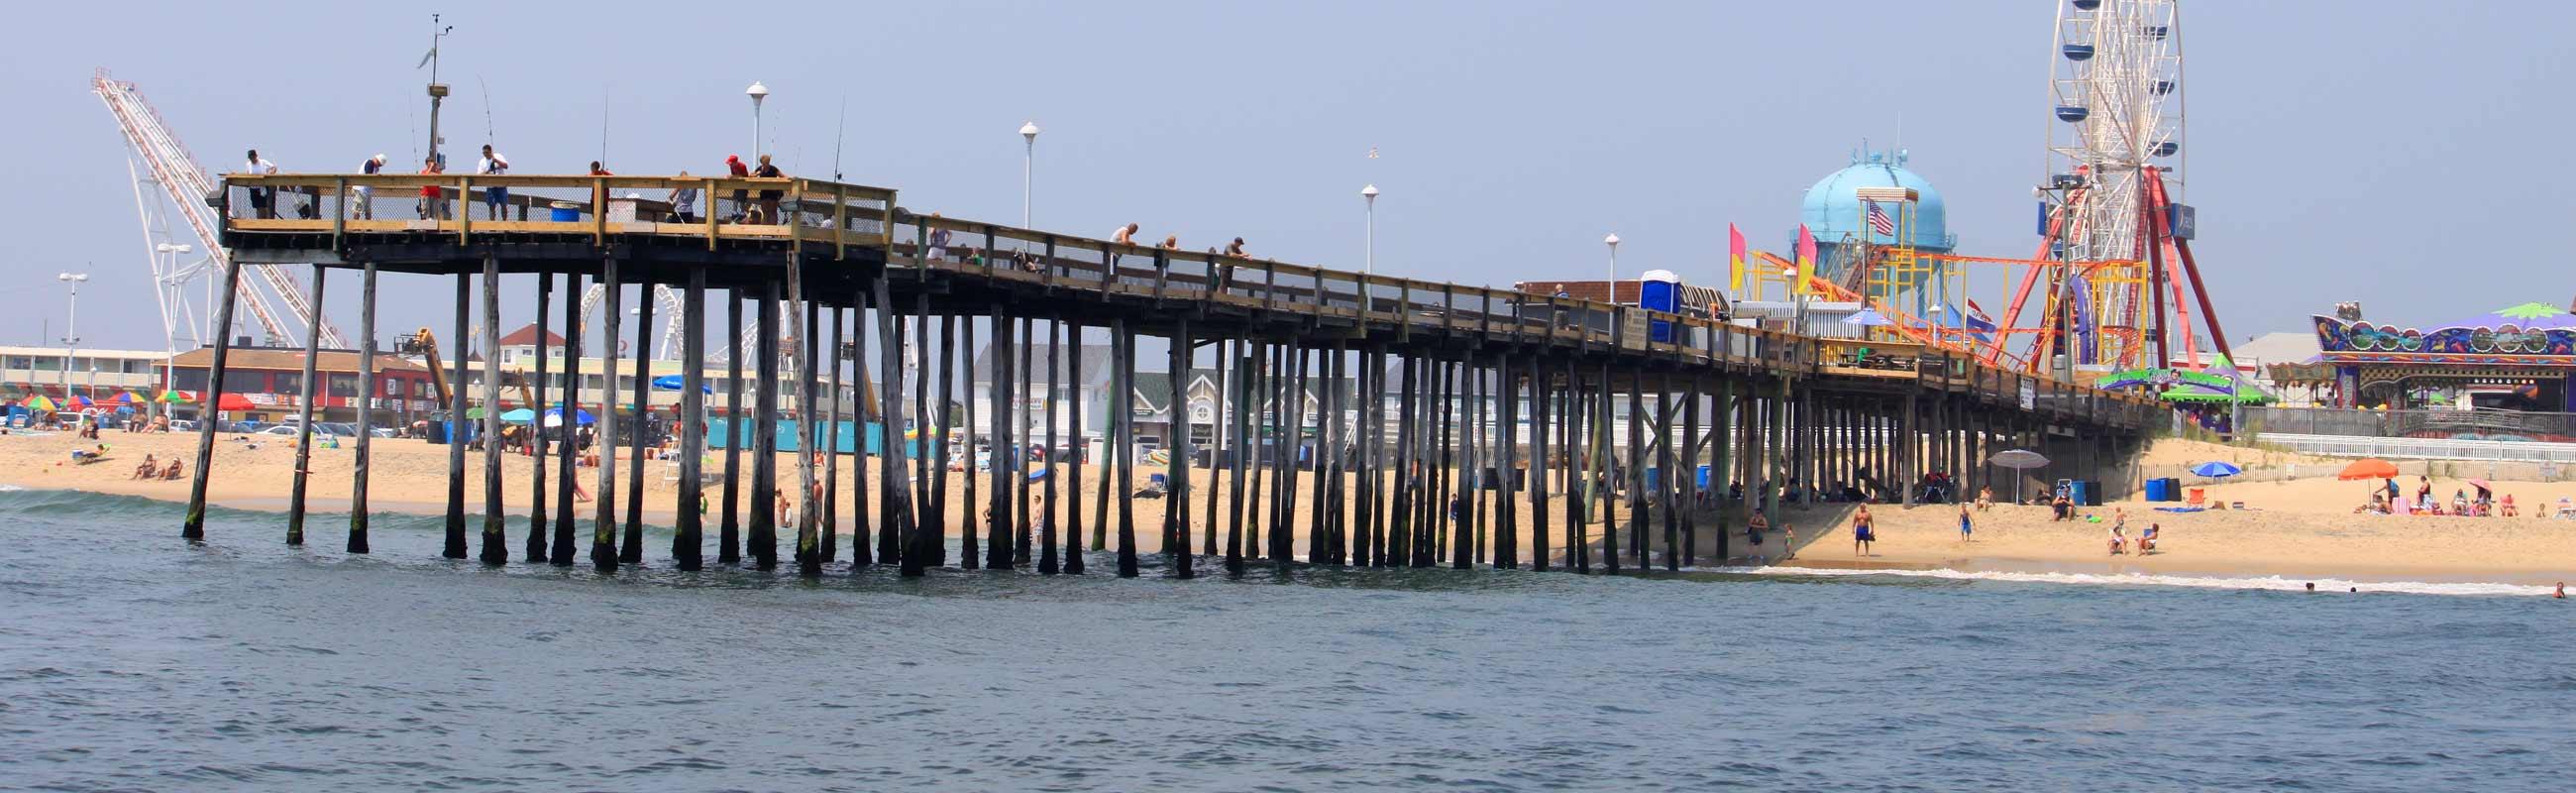 ocean city pier and boardwalk